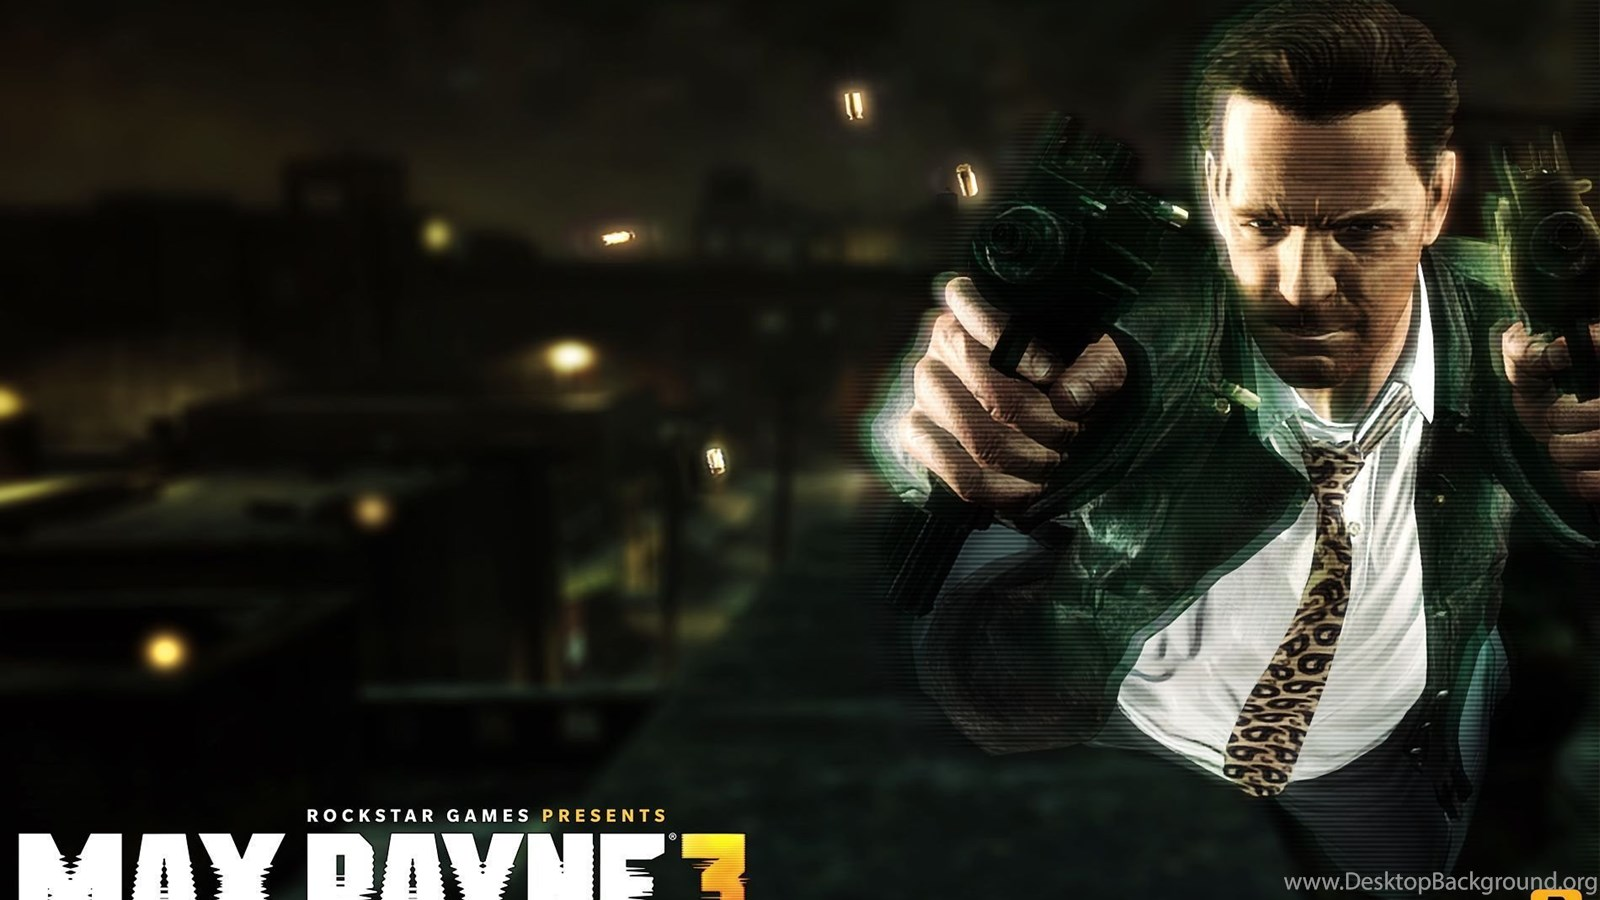 Max Payne 3 Wallpapers Hd Desktop Background